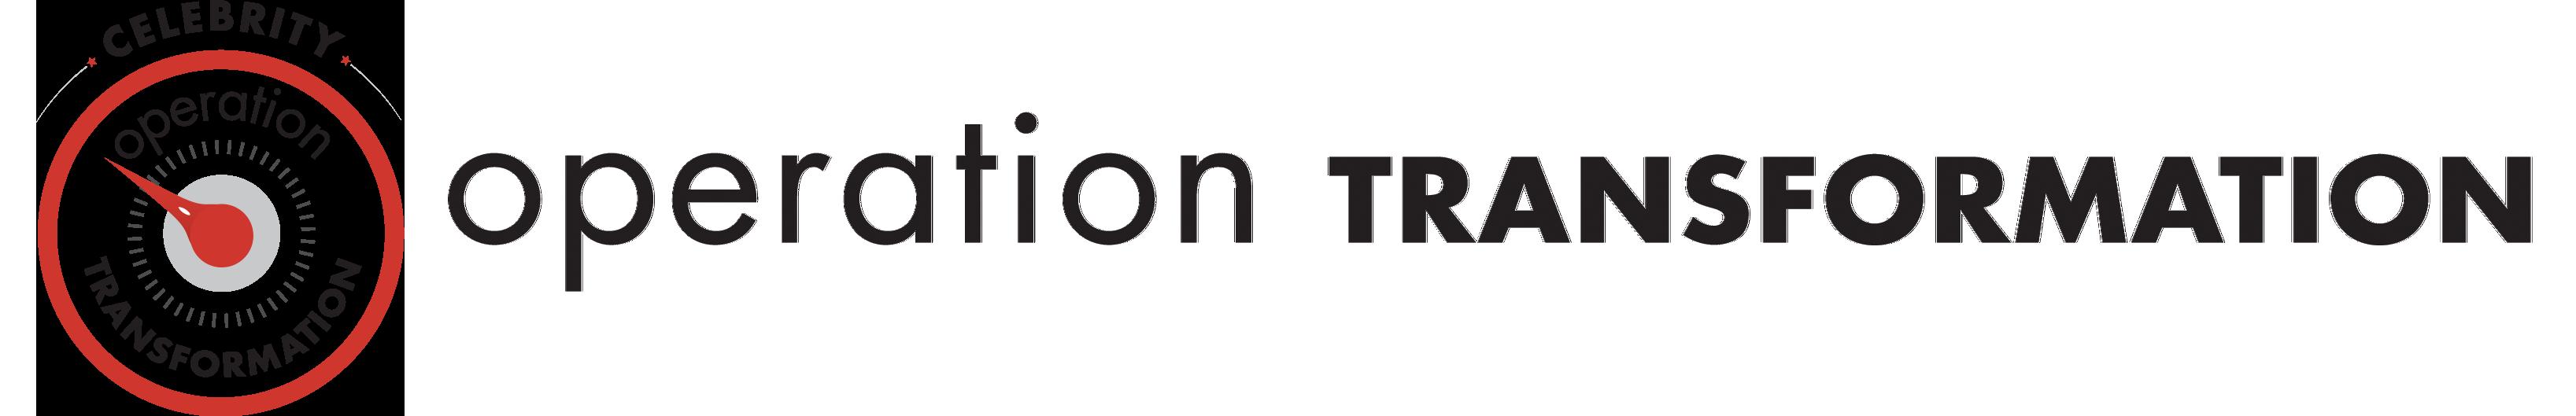 header logo celeb